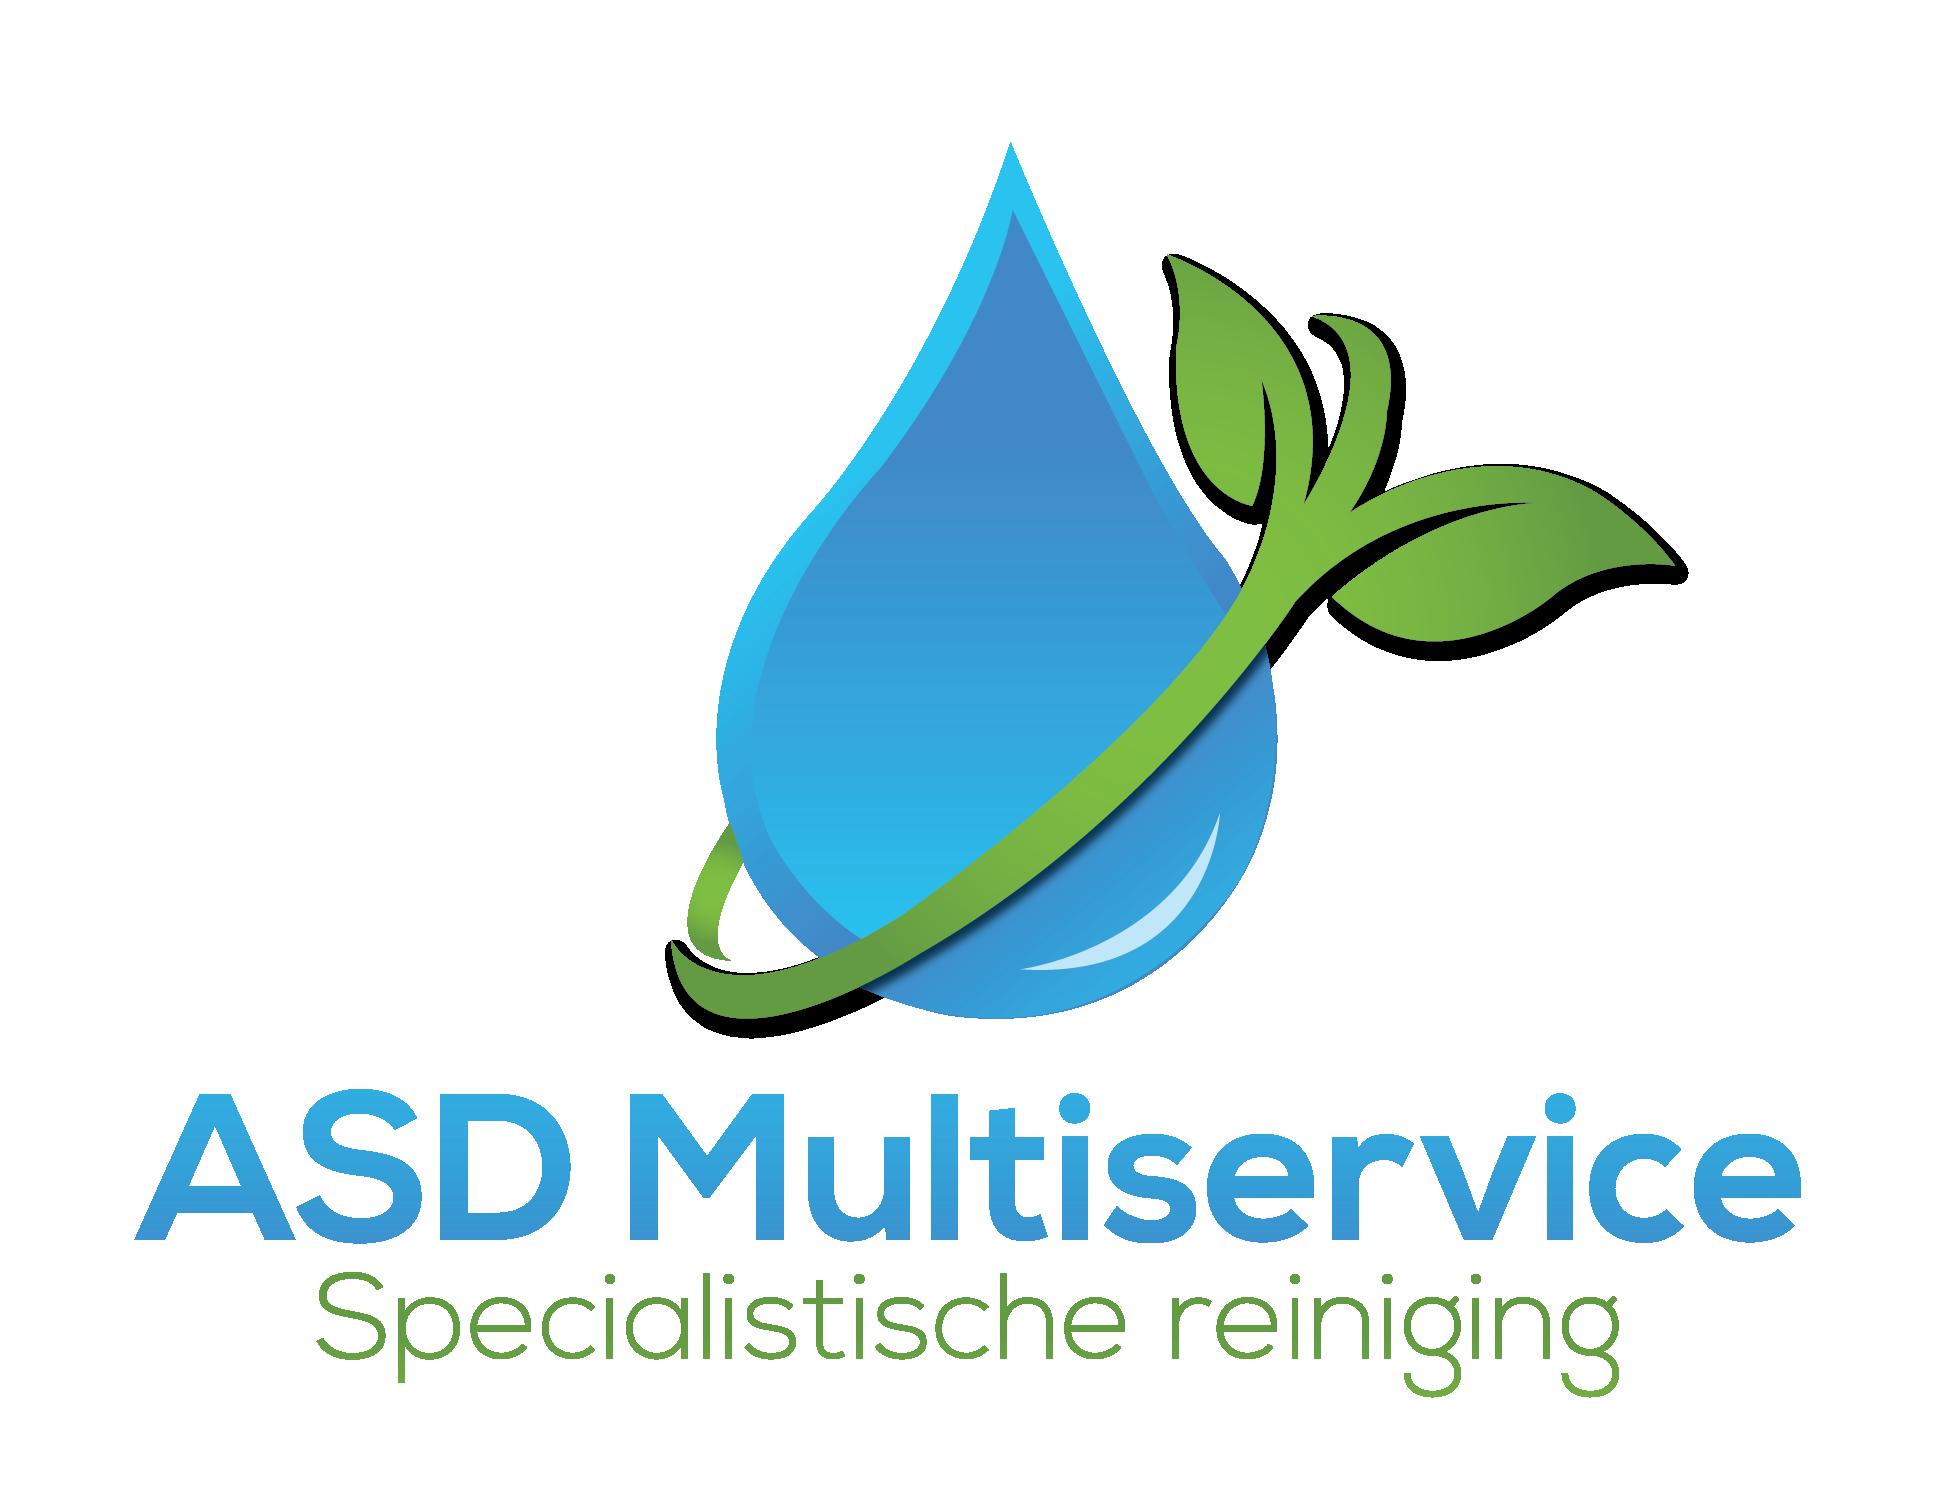 ASD Multiservice